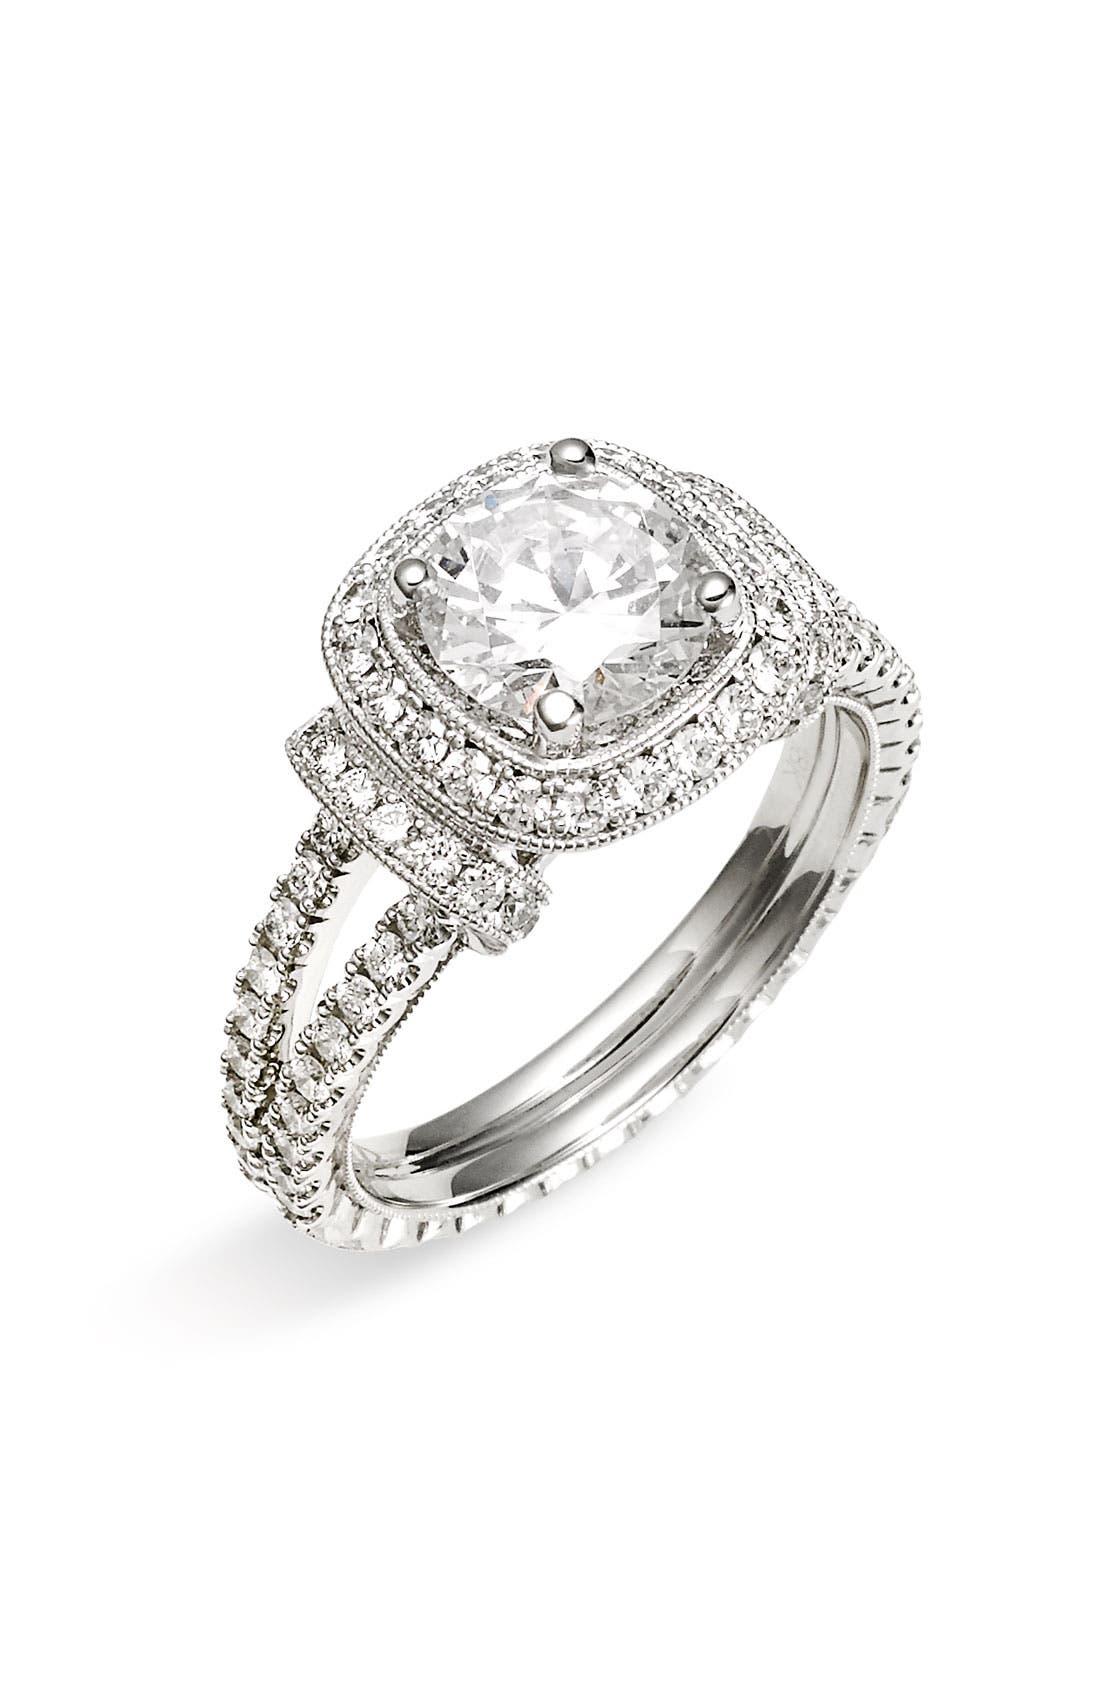 Main Image - Jack Kelége 'Romance' Cushion Set Diamond Engagement Ring Setting